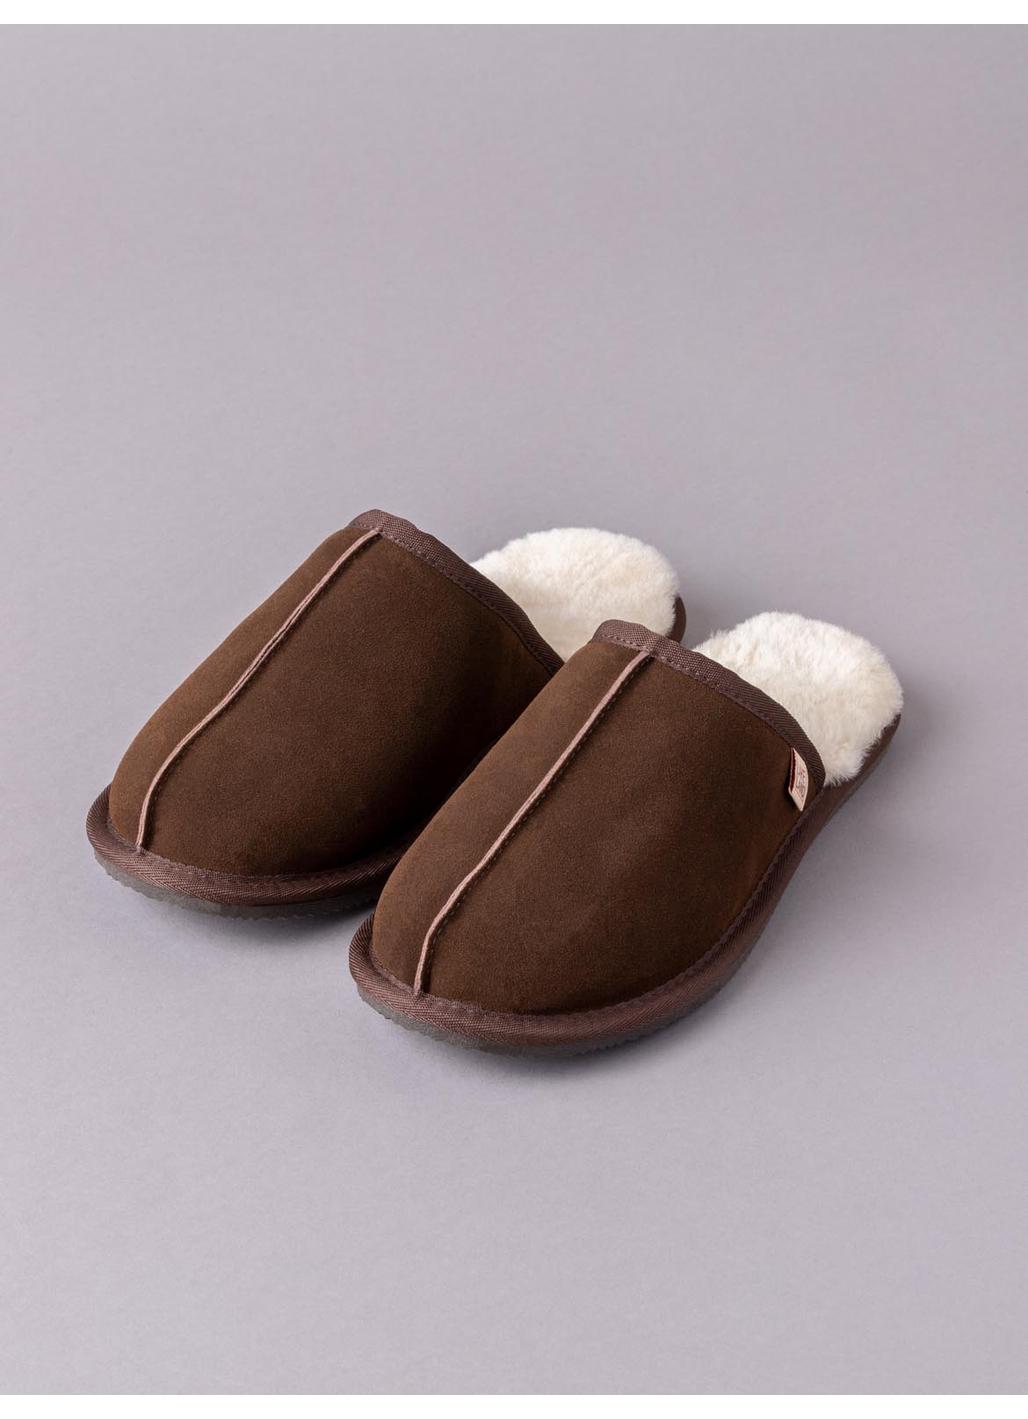 Men's Sheepskin Sliders in Brown